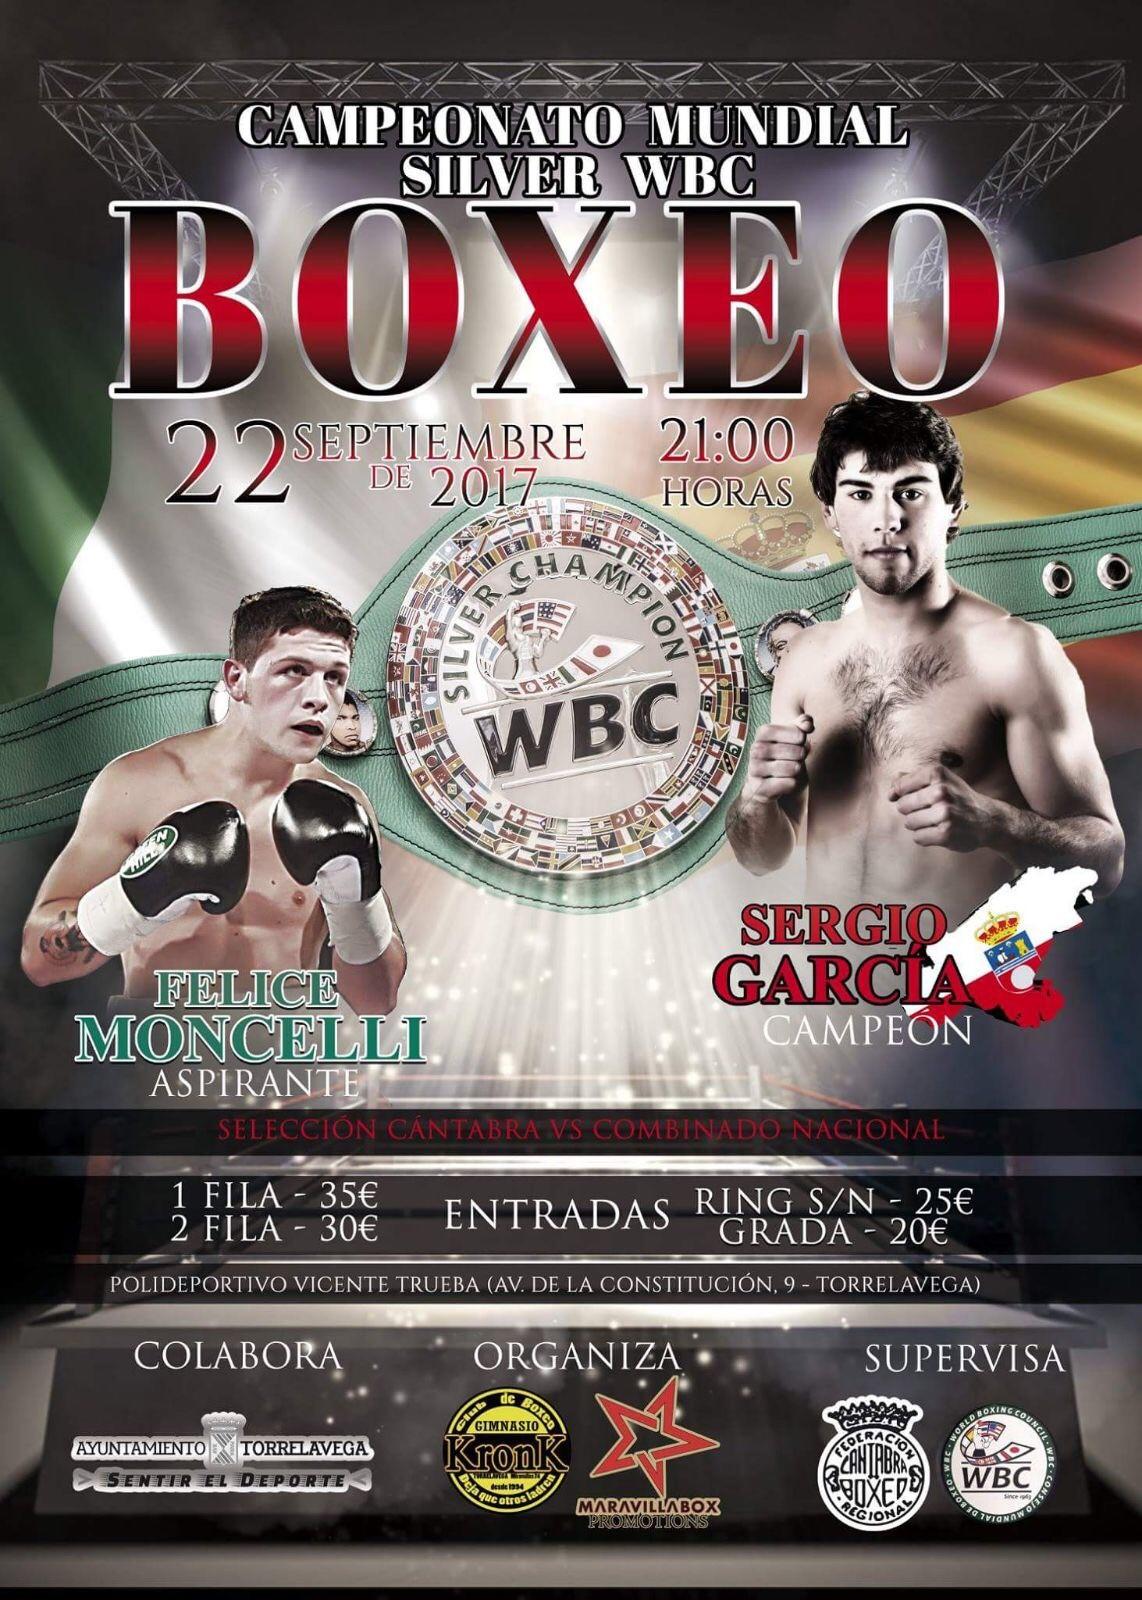 http://suljosblog.com/suljos/wp-content/uploads/2017/08/MONCELLI-GARCIA-SILVER-WBC.jpg